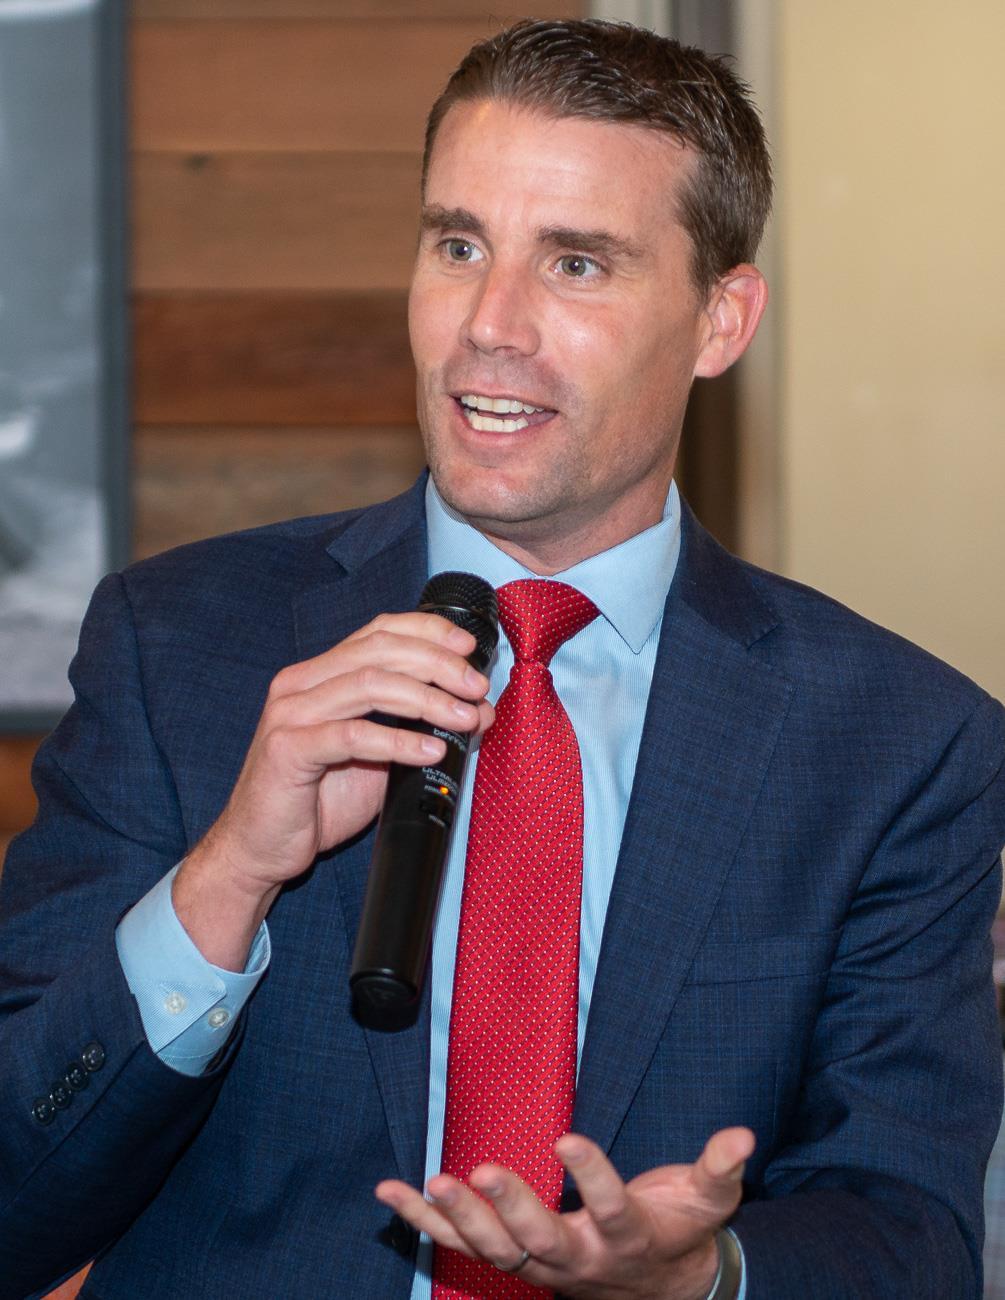 Speaker State Sen. Mike McGuire